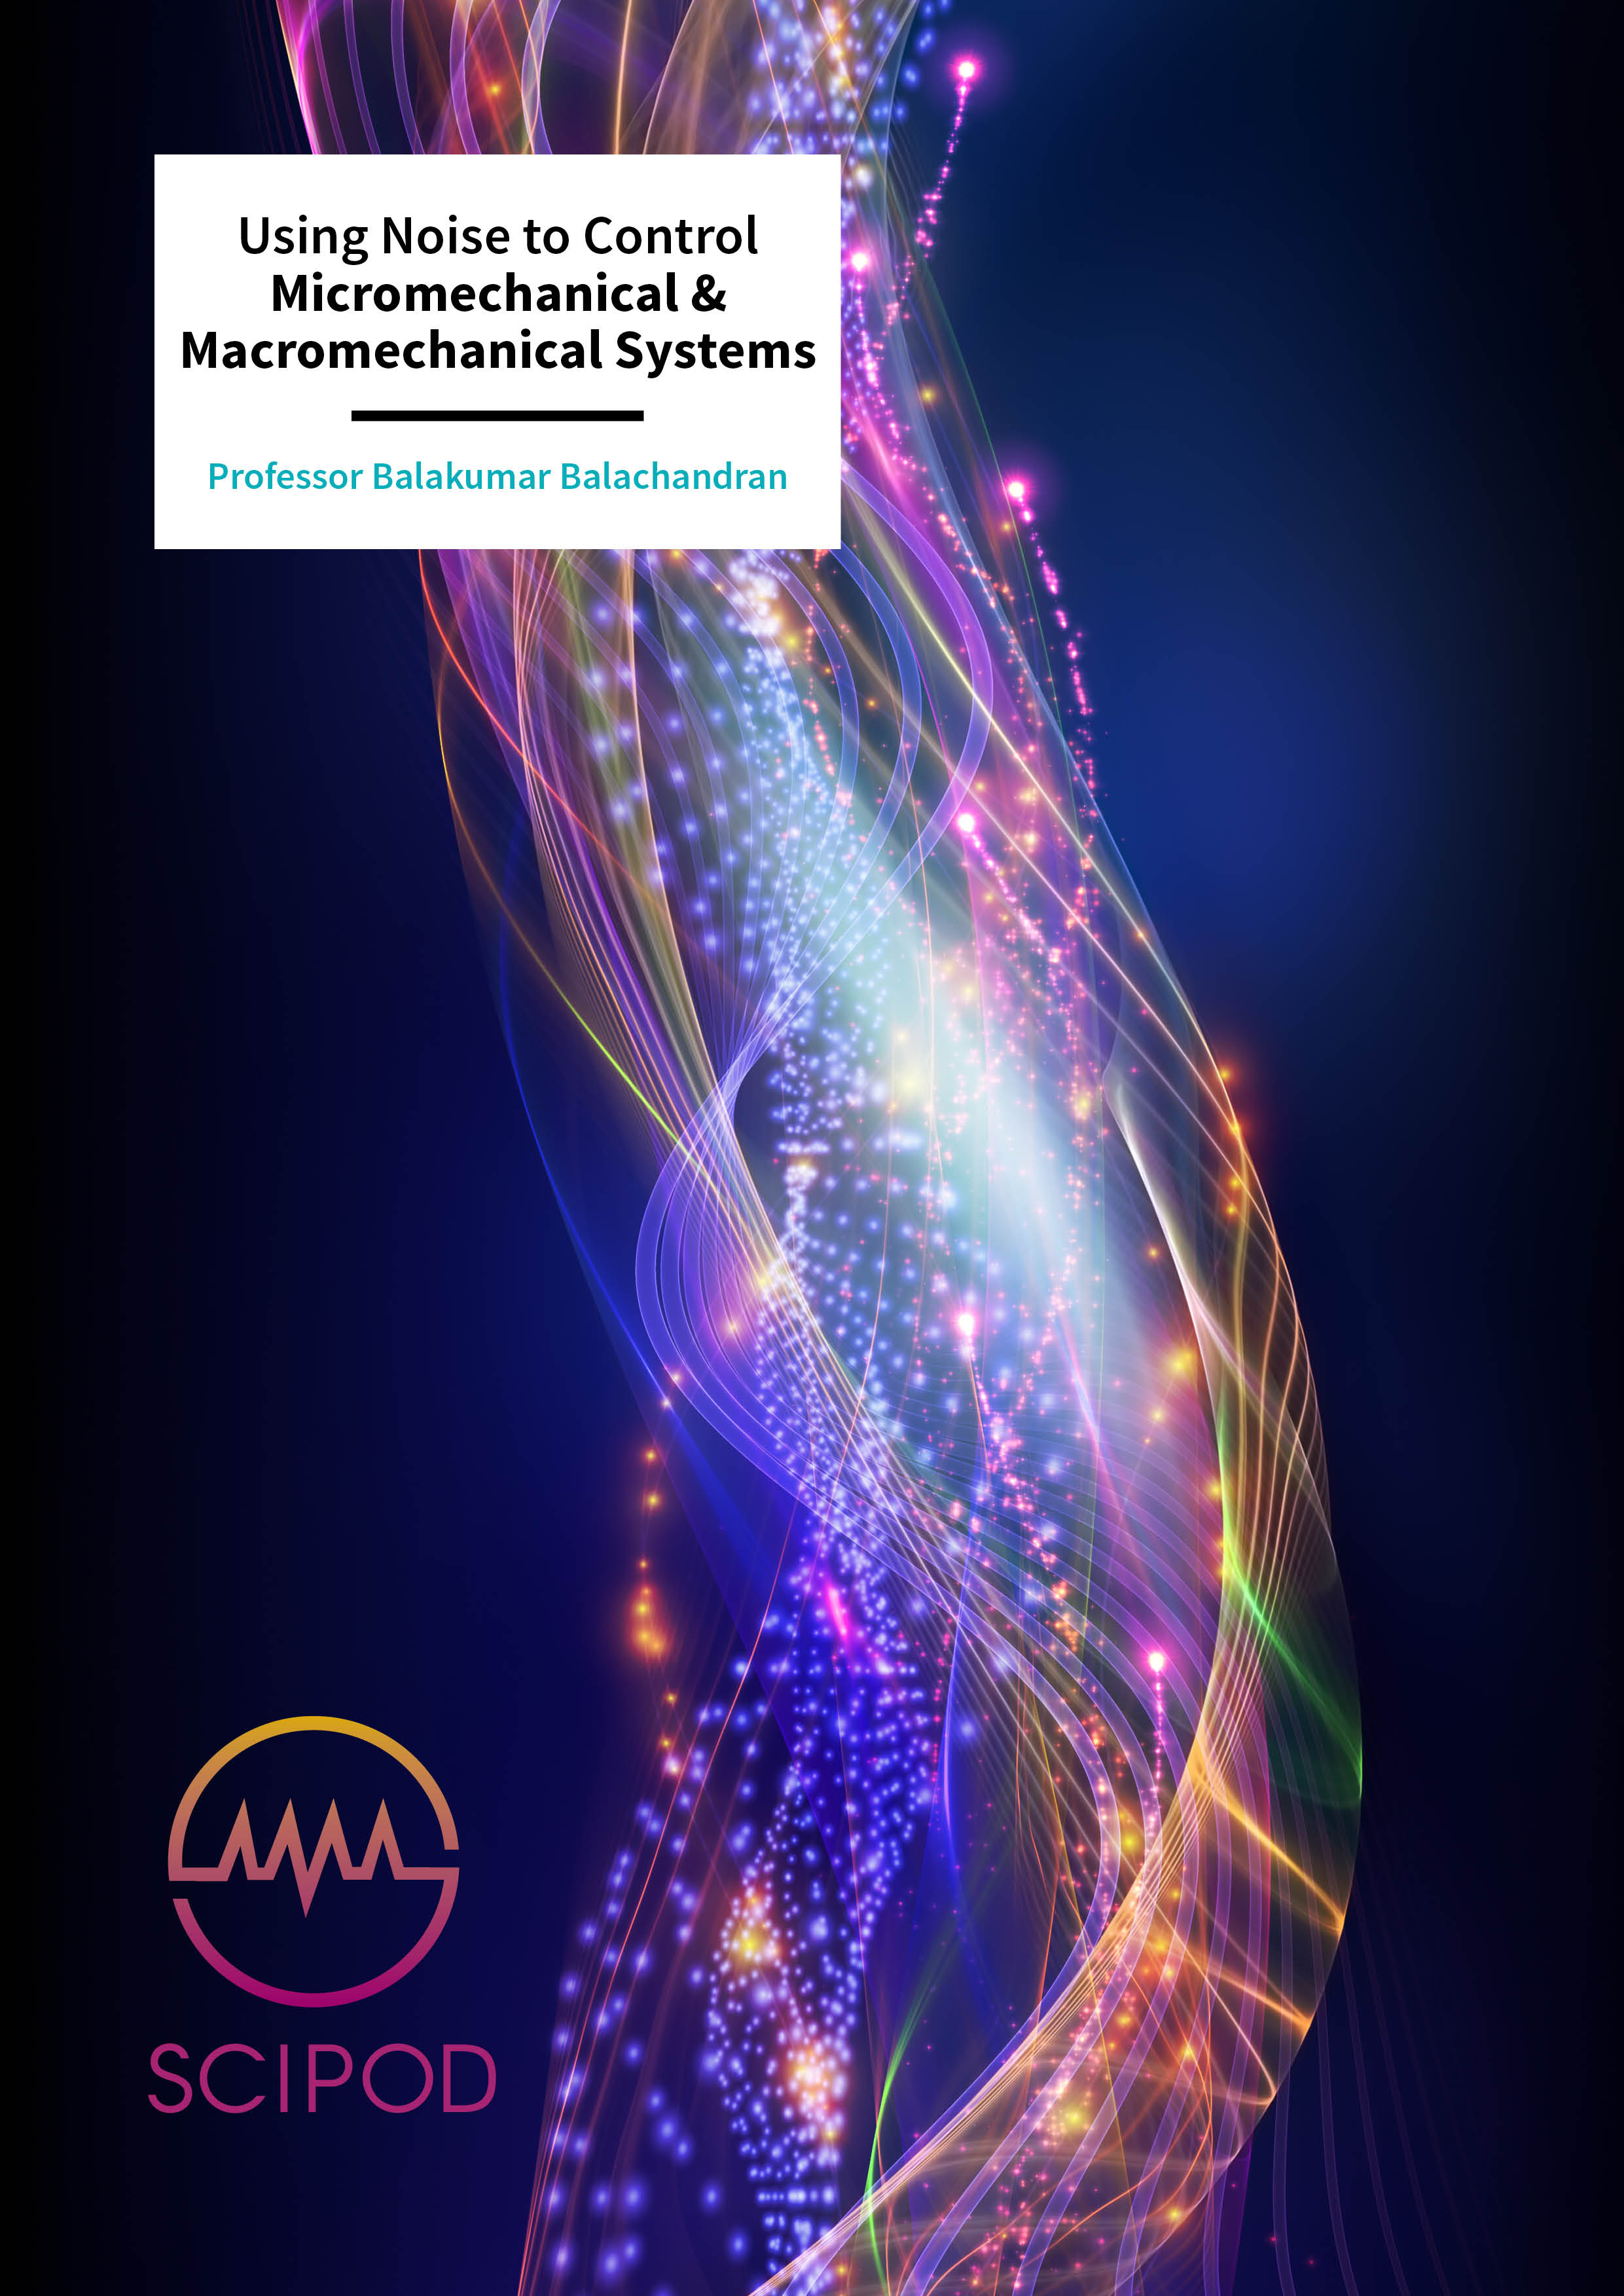 Using Noise to Control Micromechanical & Macromechanical Systems – Professor Balakumar Balachandran, University of Maryland